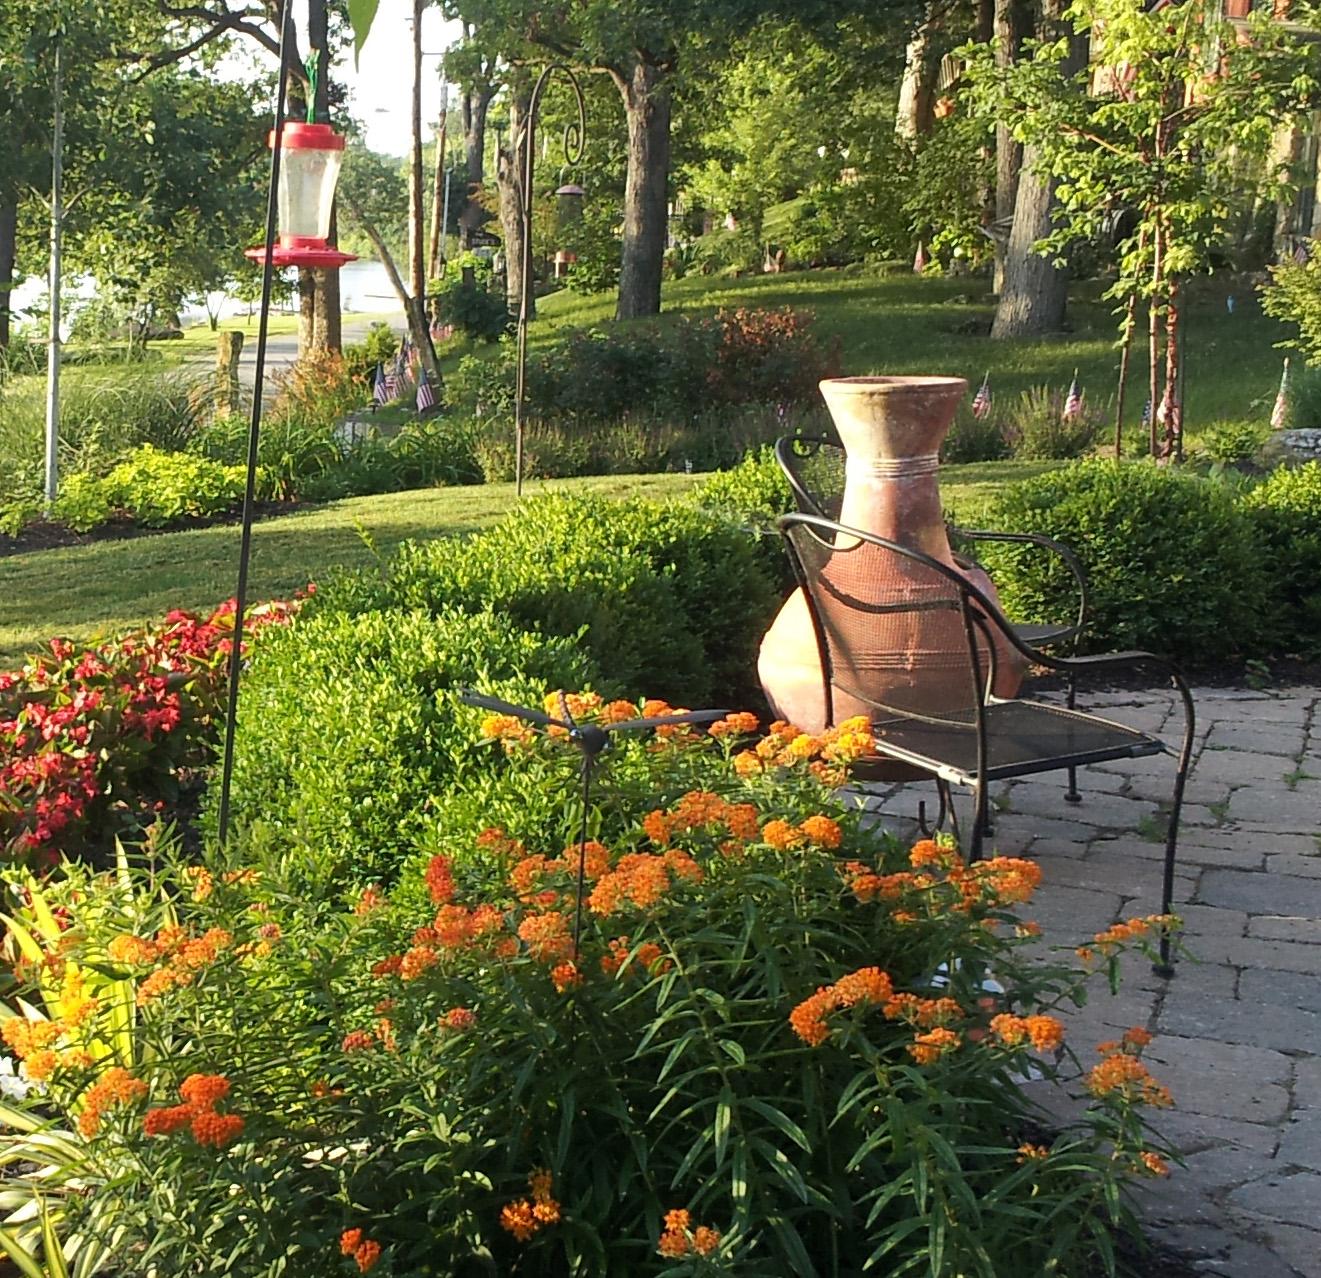 Landscape designers have extensive horticultural knowledge.